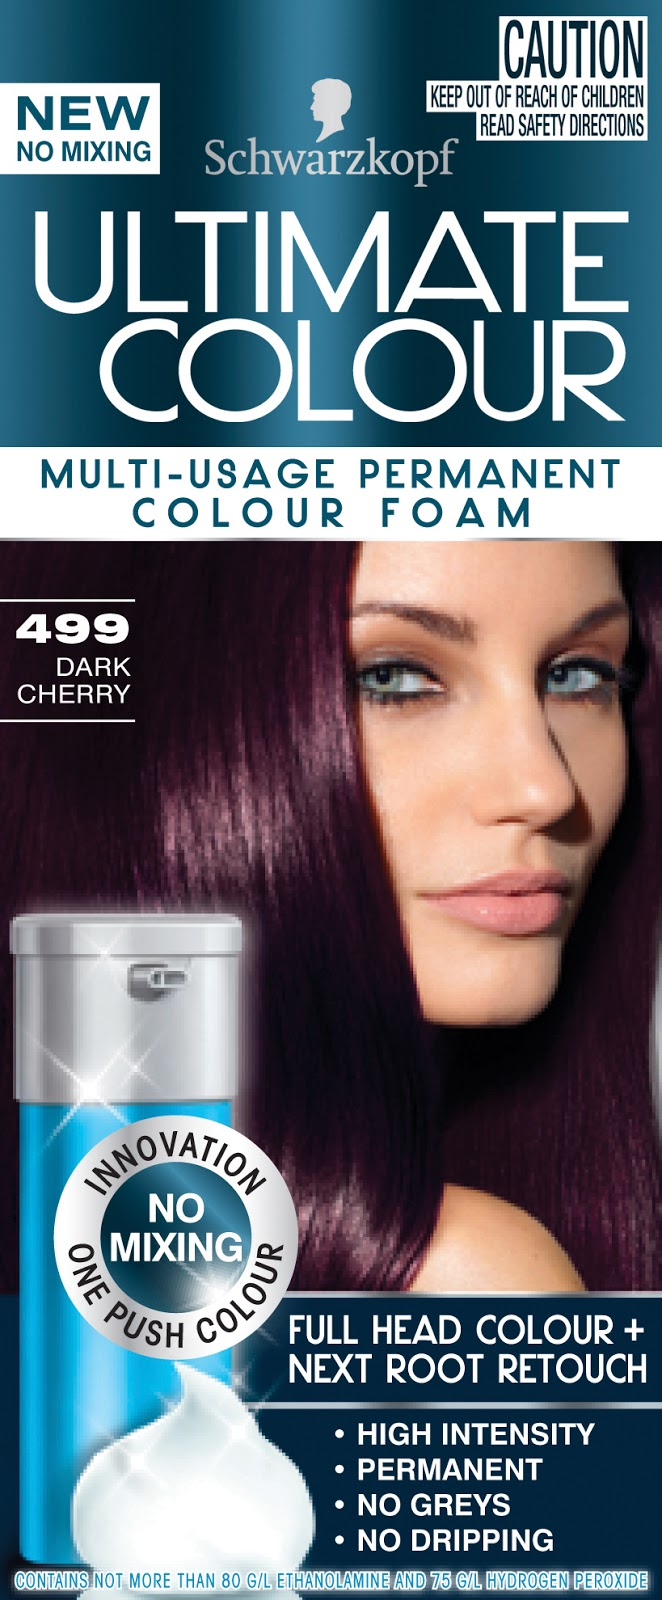 Red Hair Dye For Dark Hair Walmart